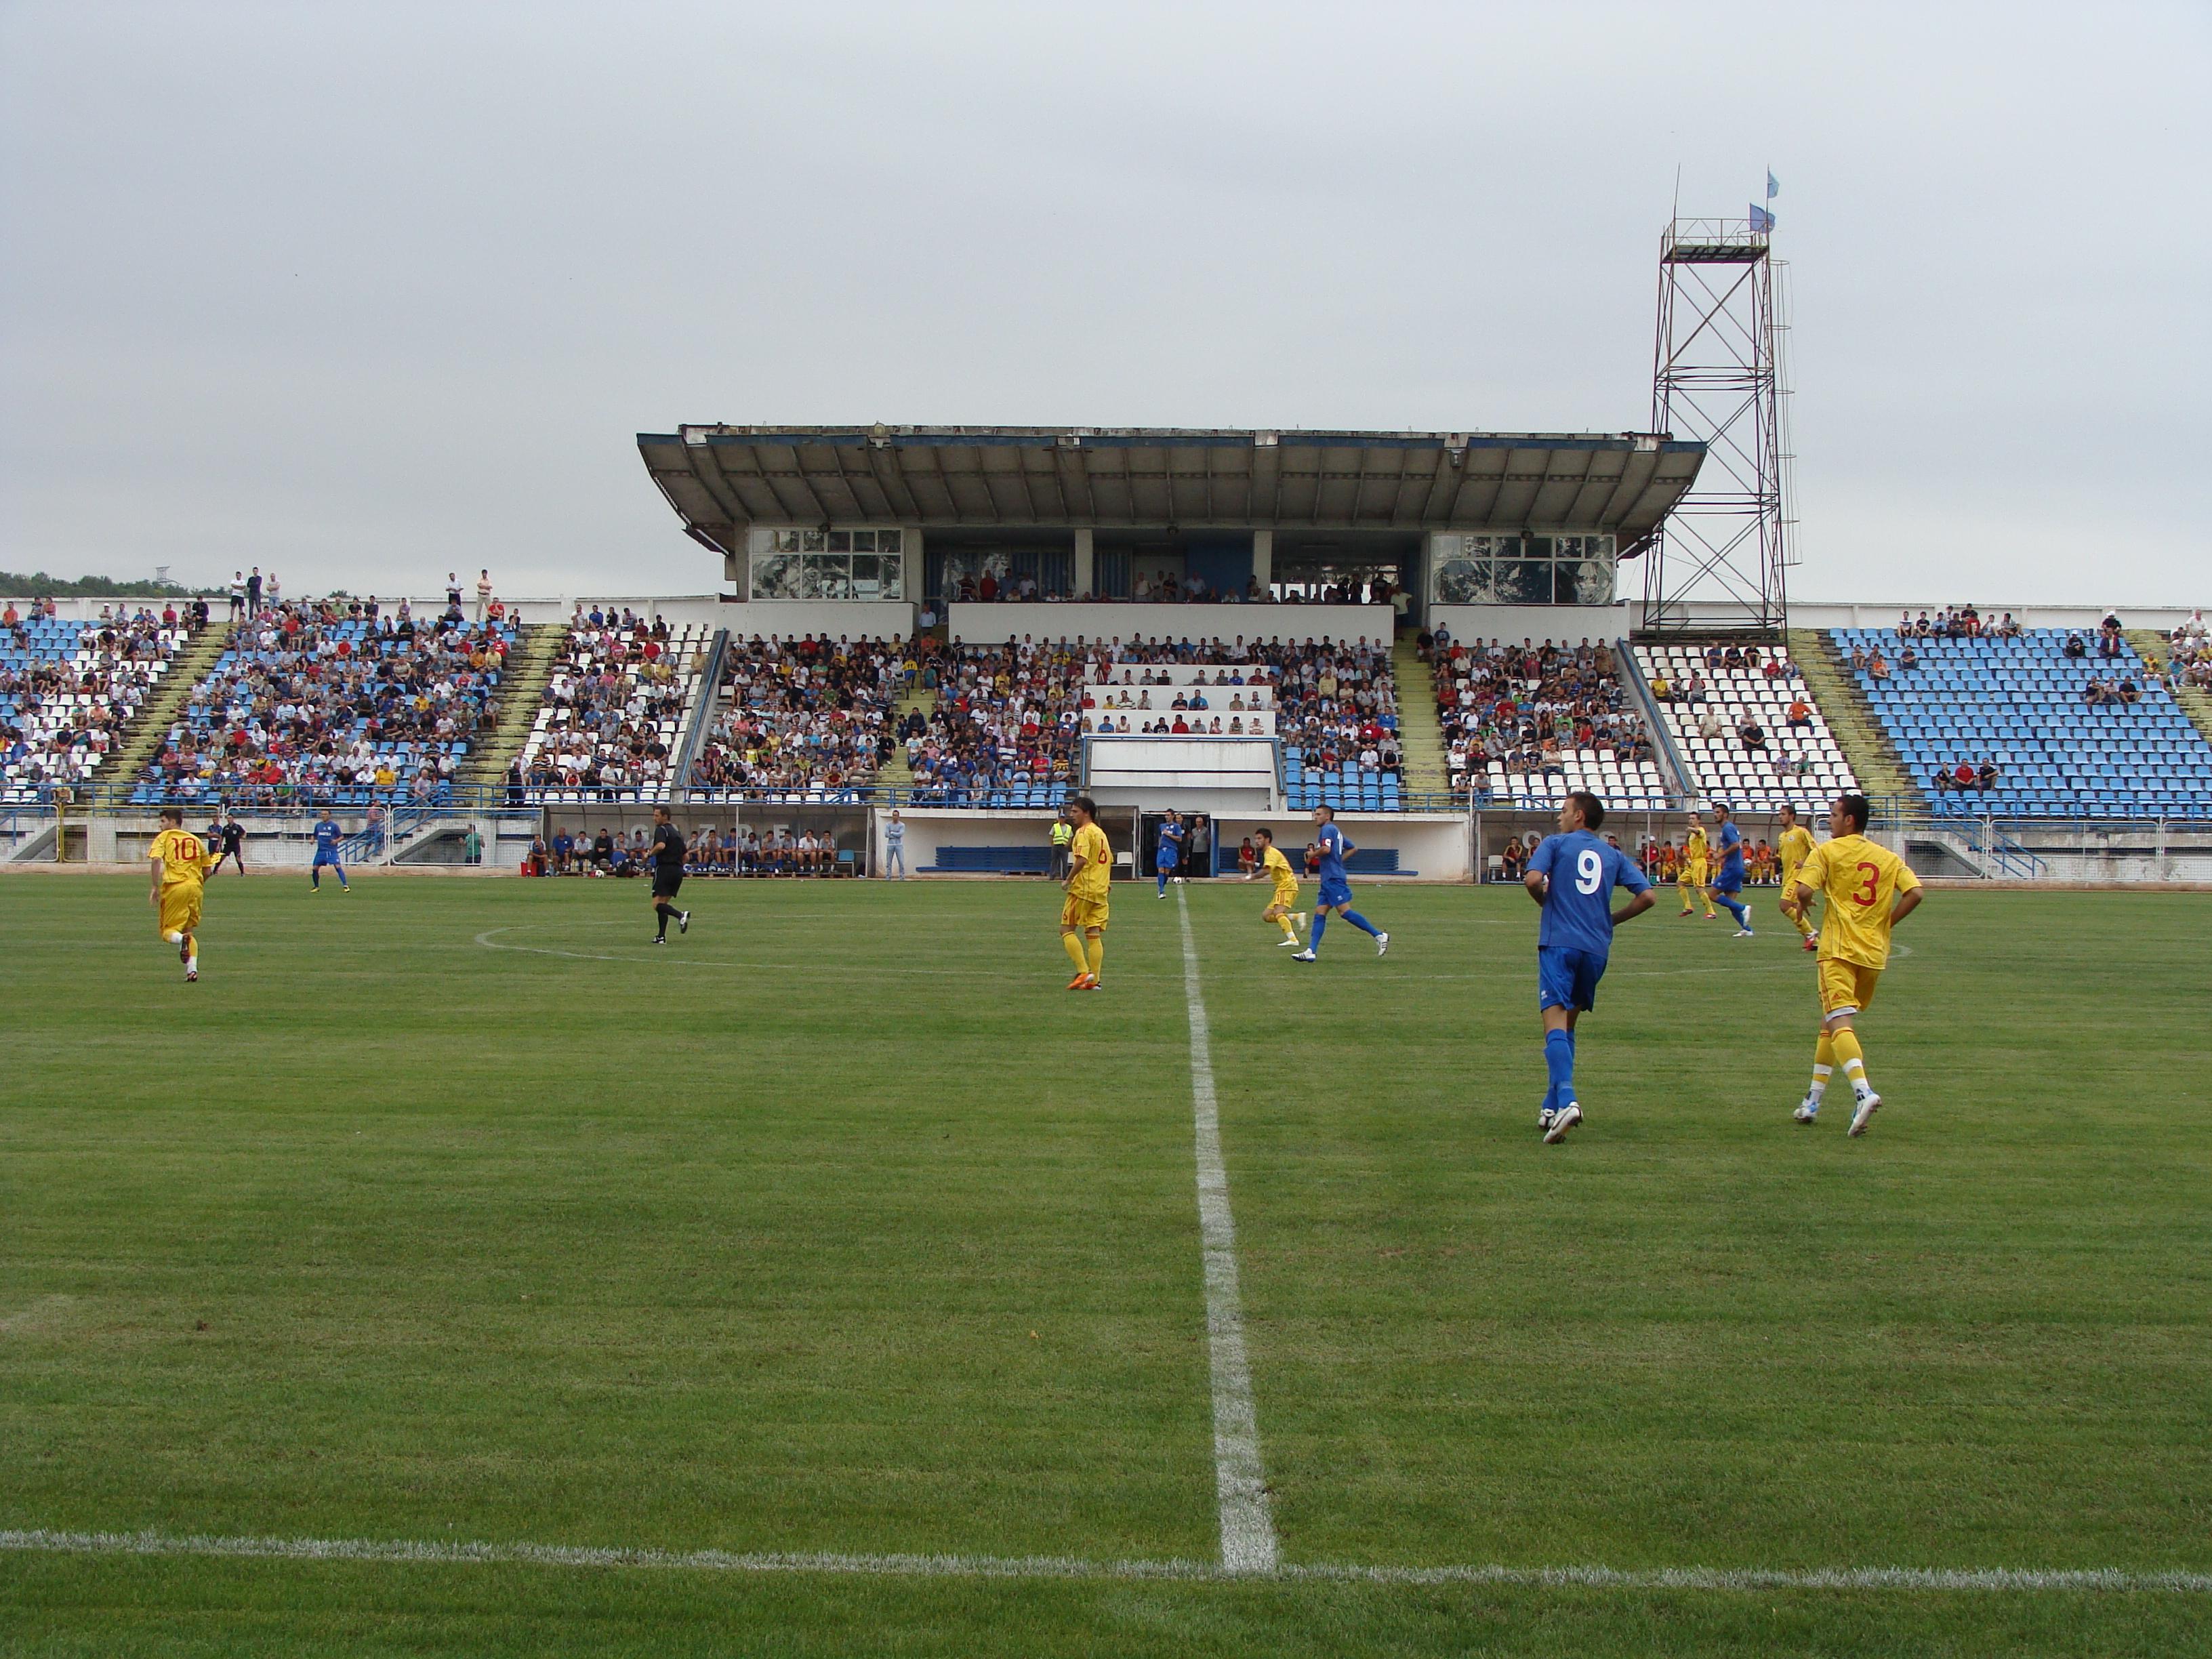 Imagini pentru csm slatina stadion